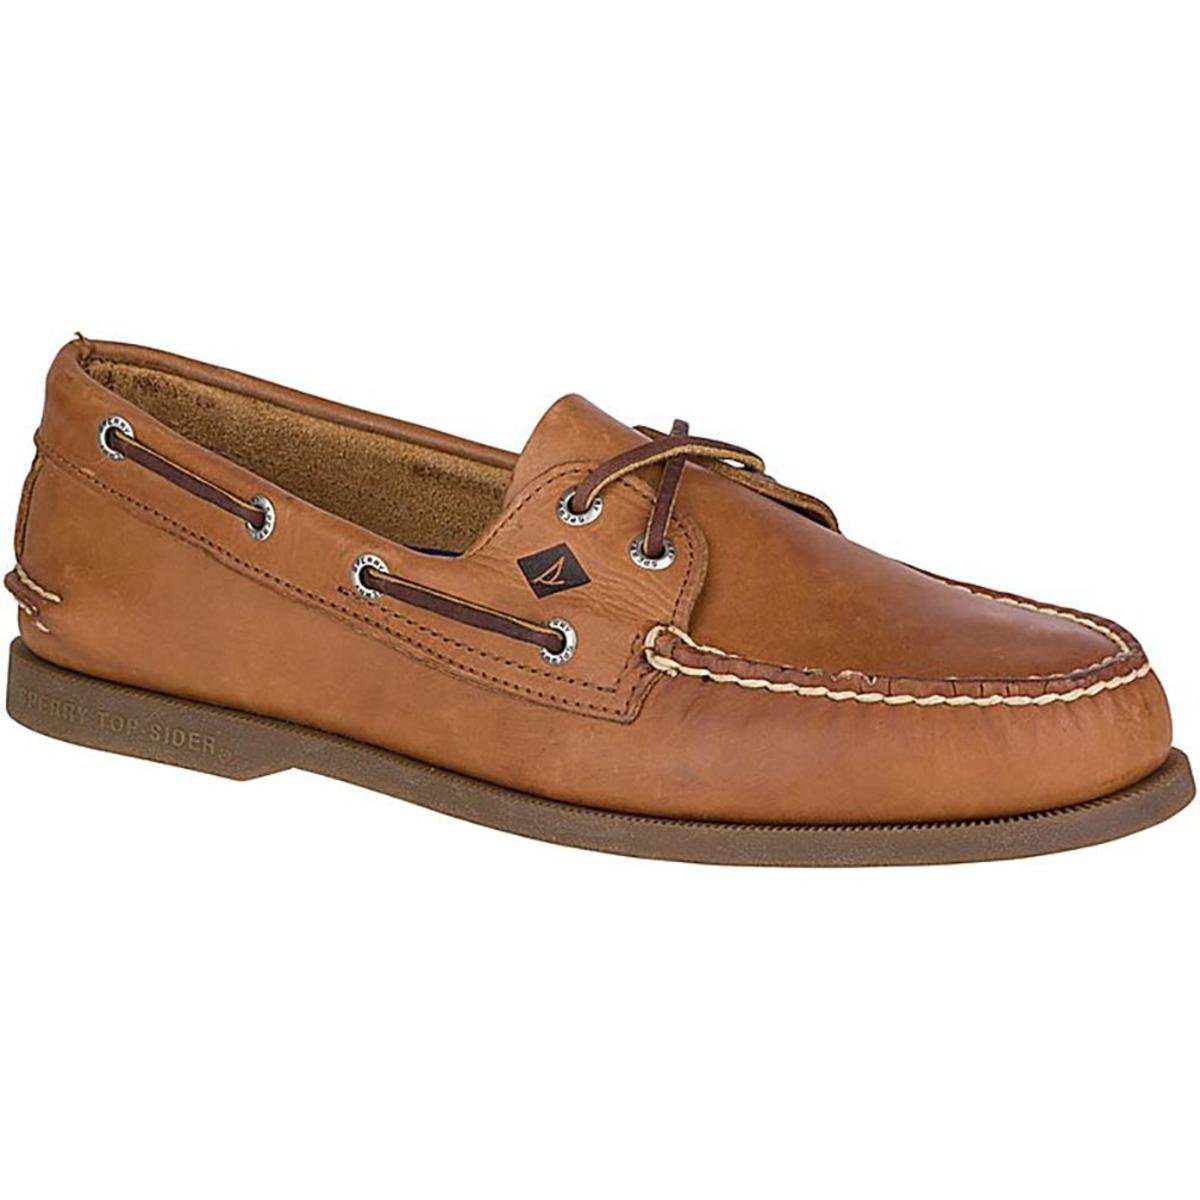 Sperry Top-Sider Men's A/O 2 Eye Boat Shoe,Sahara,10.5 M US